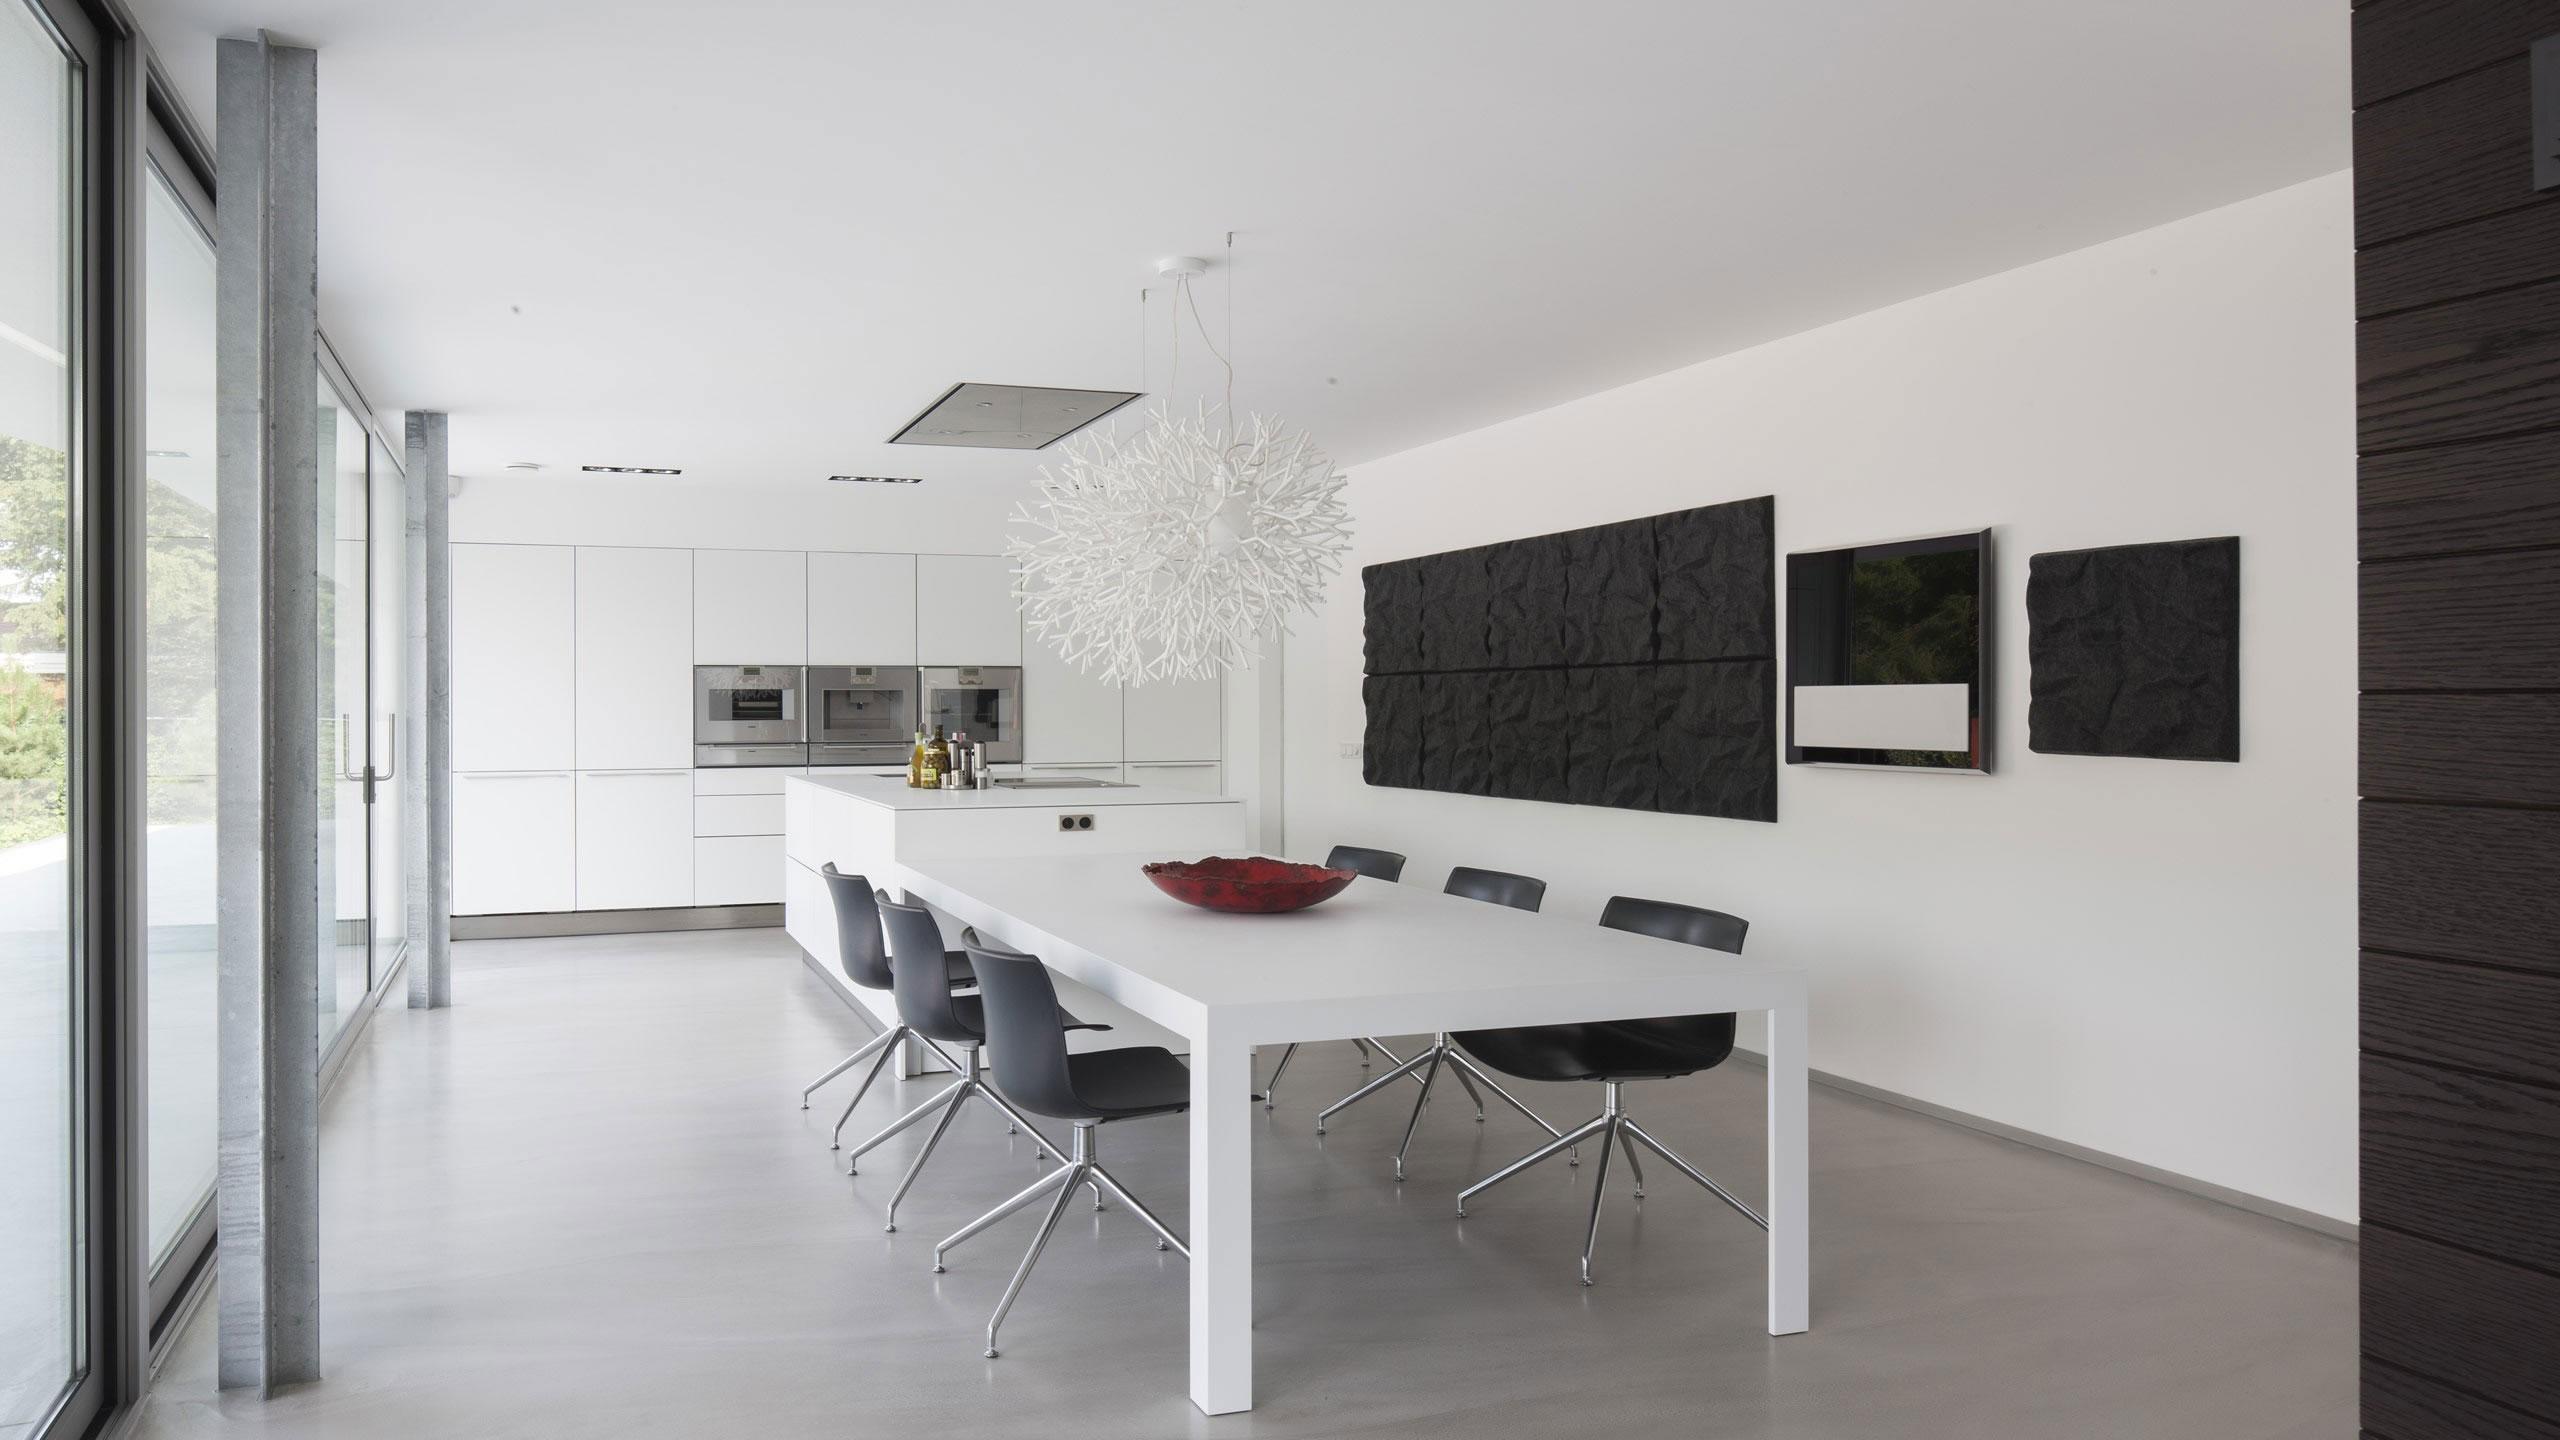 Boxed Villa Spee Haelen with Panoramic Windows by Lab32 architecten-20